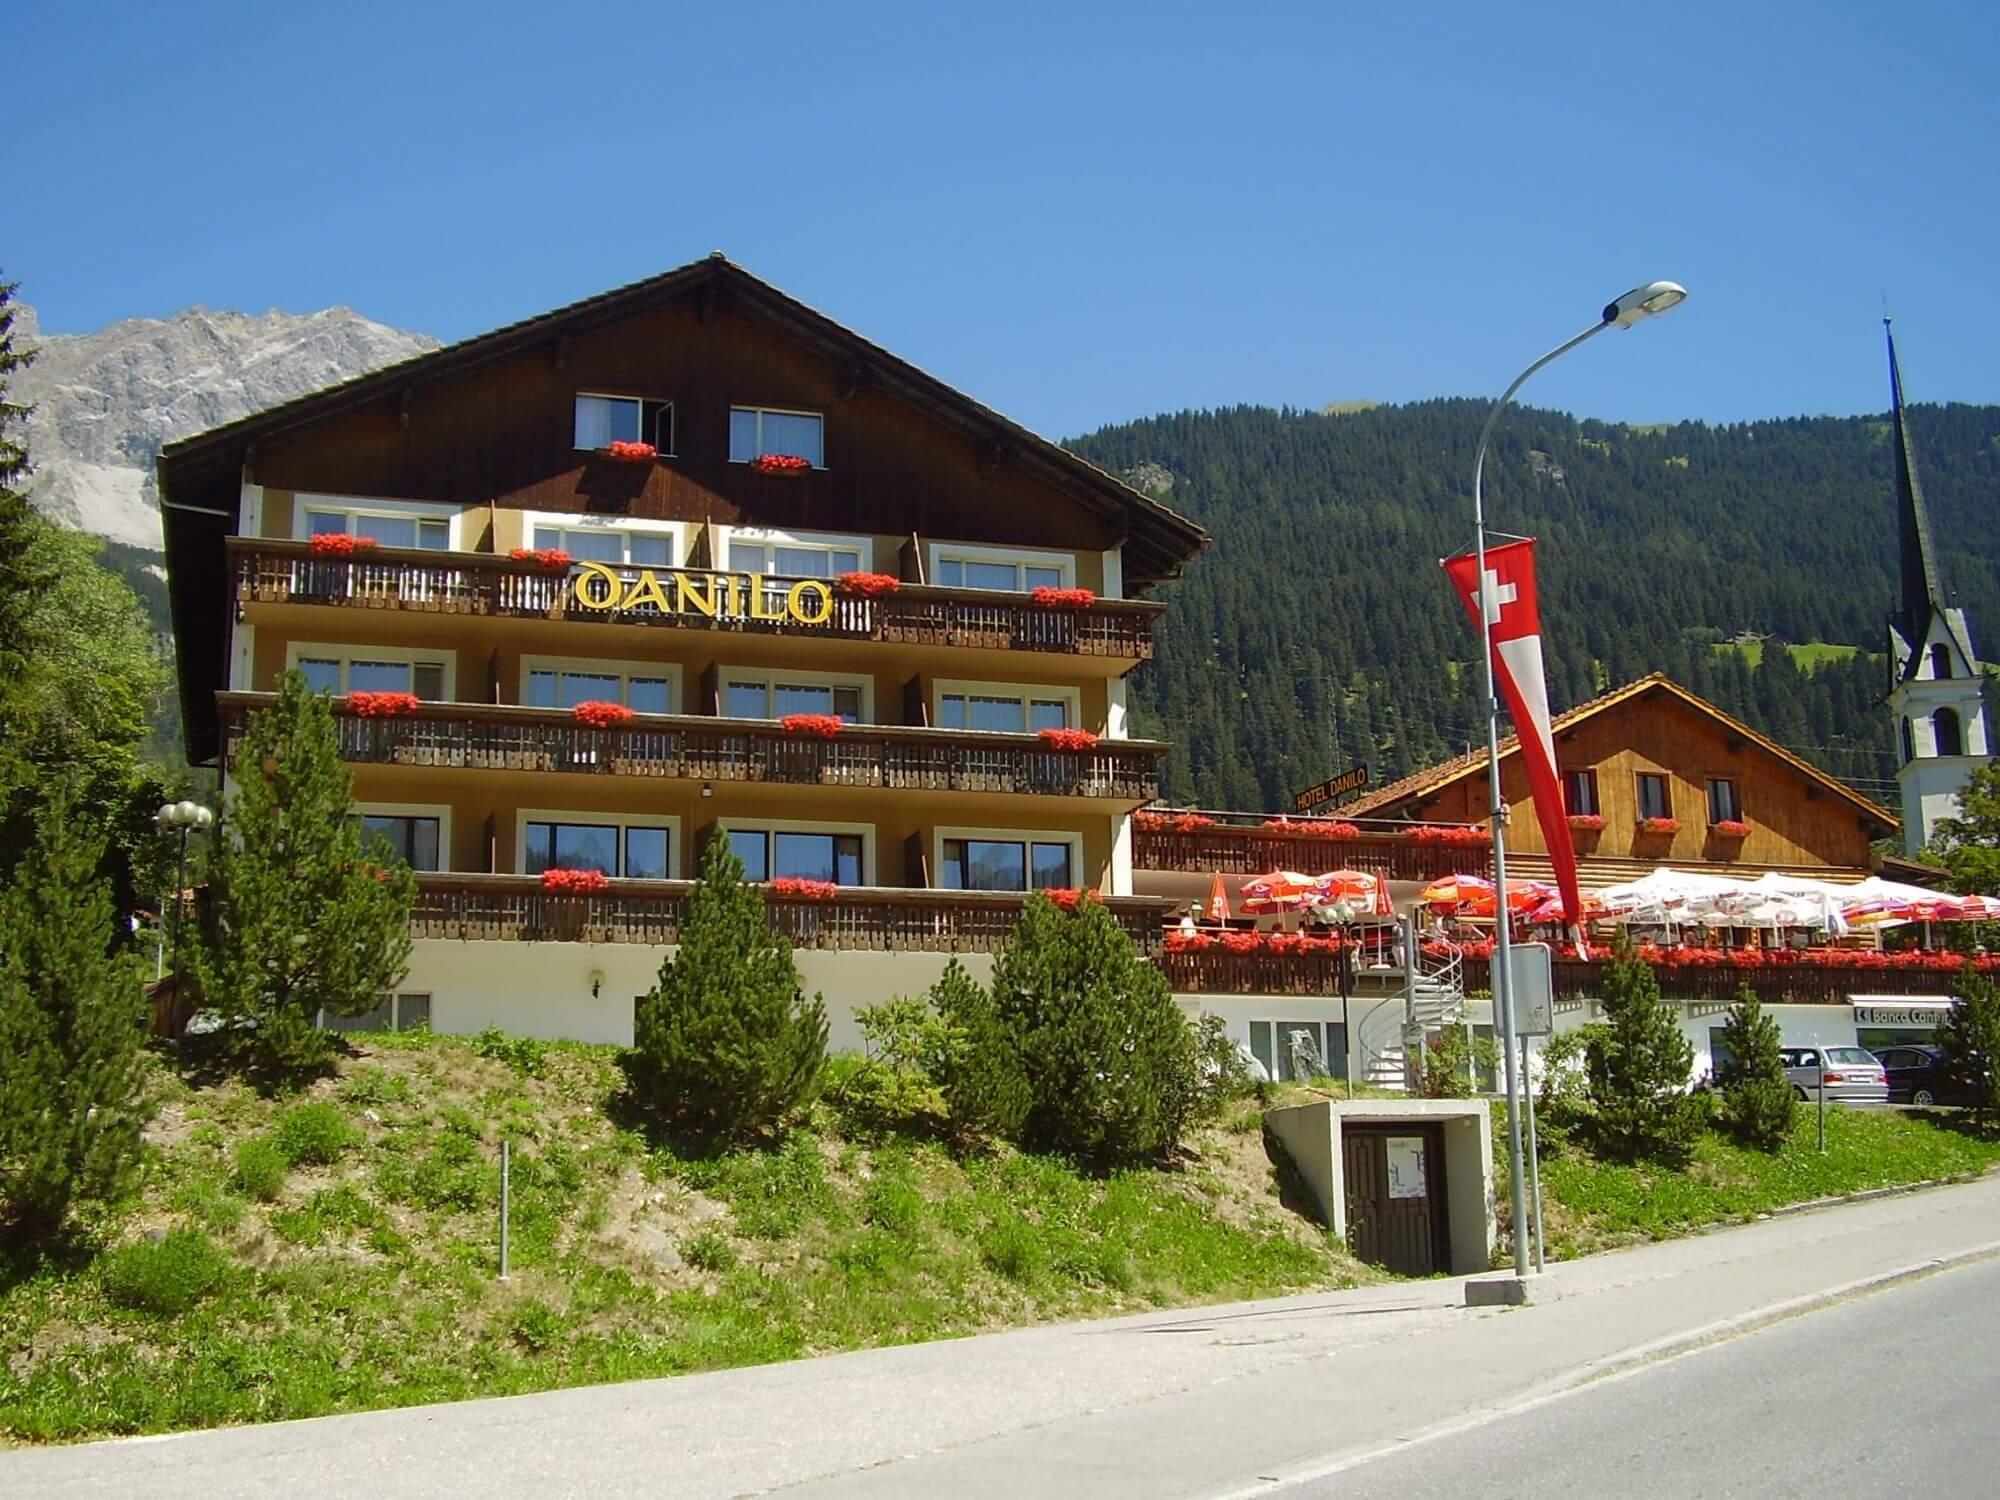 3-tage-im-hotel-danilo-in-savognin